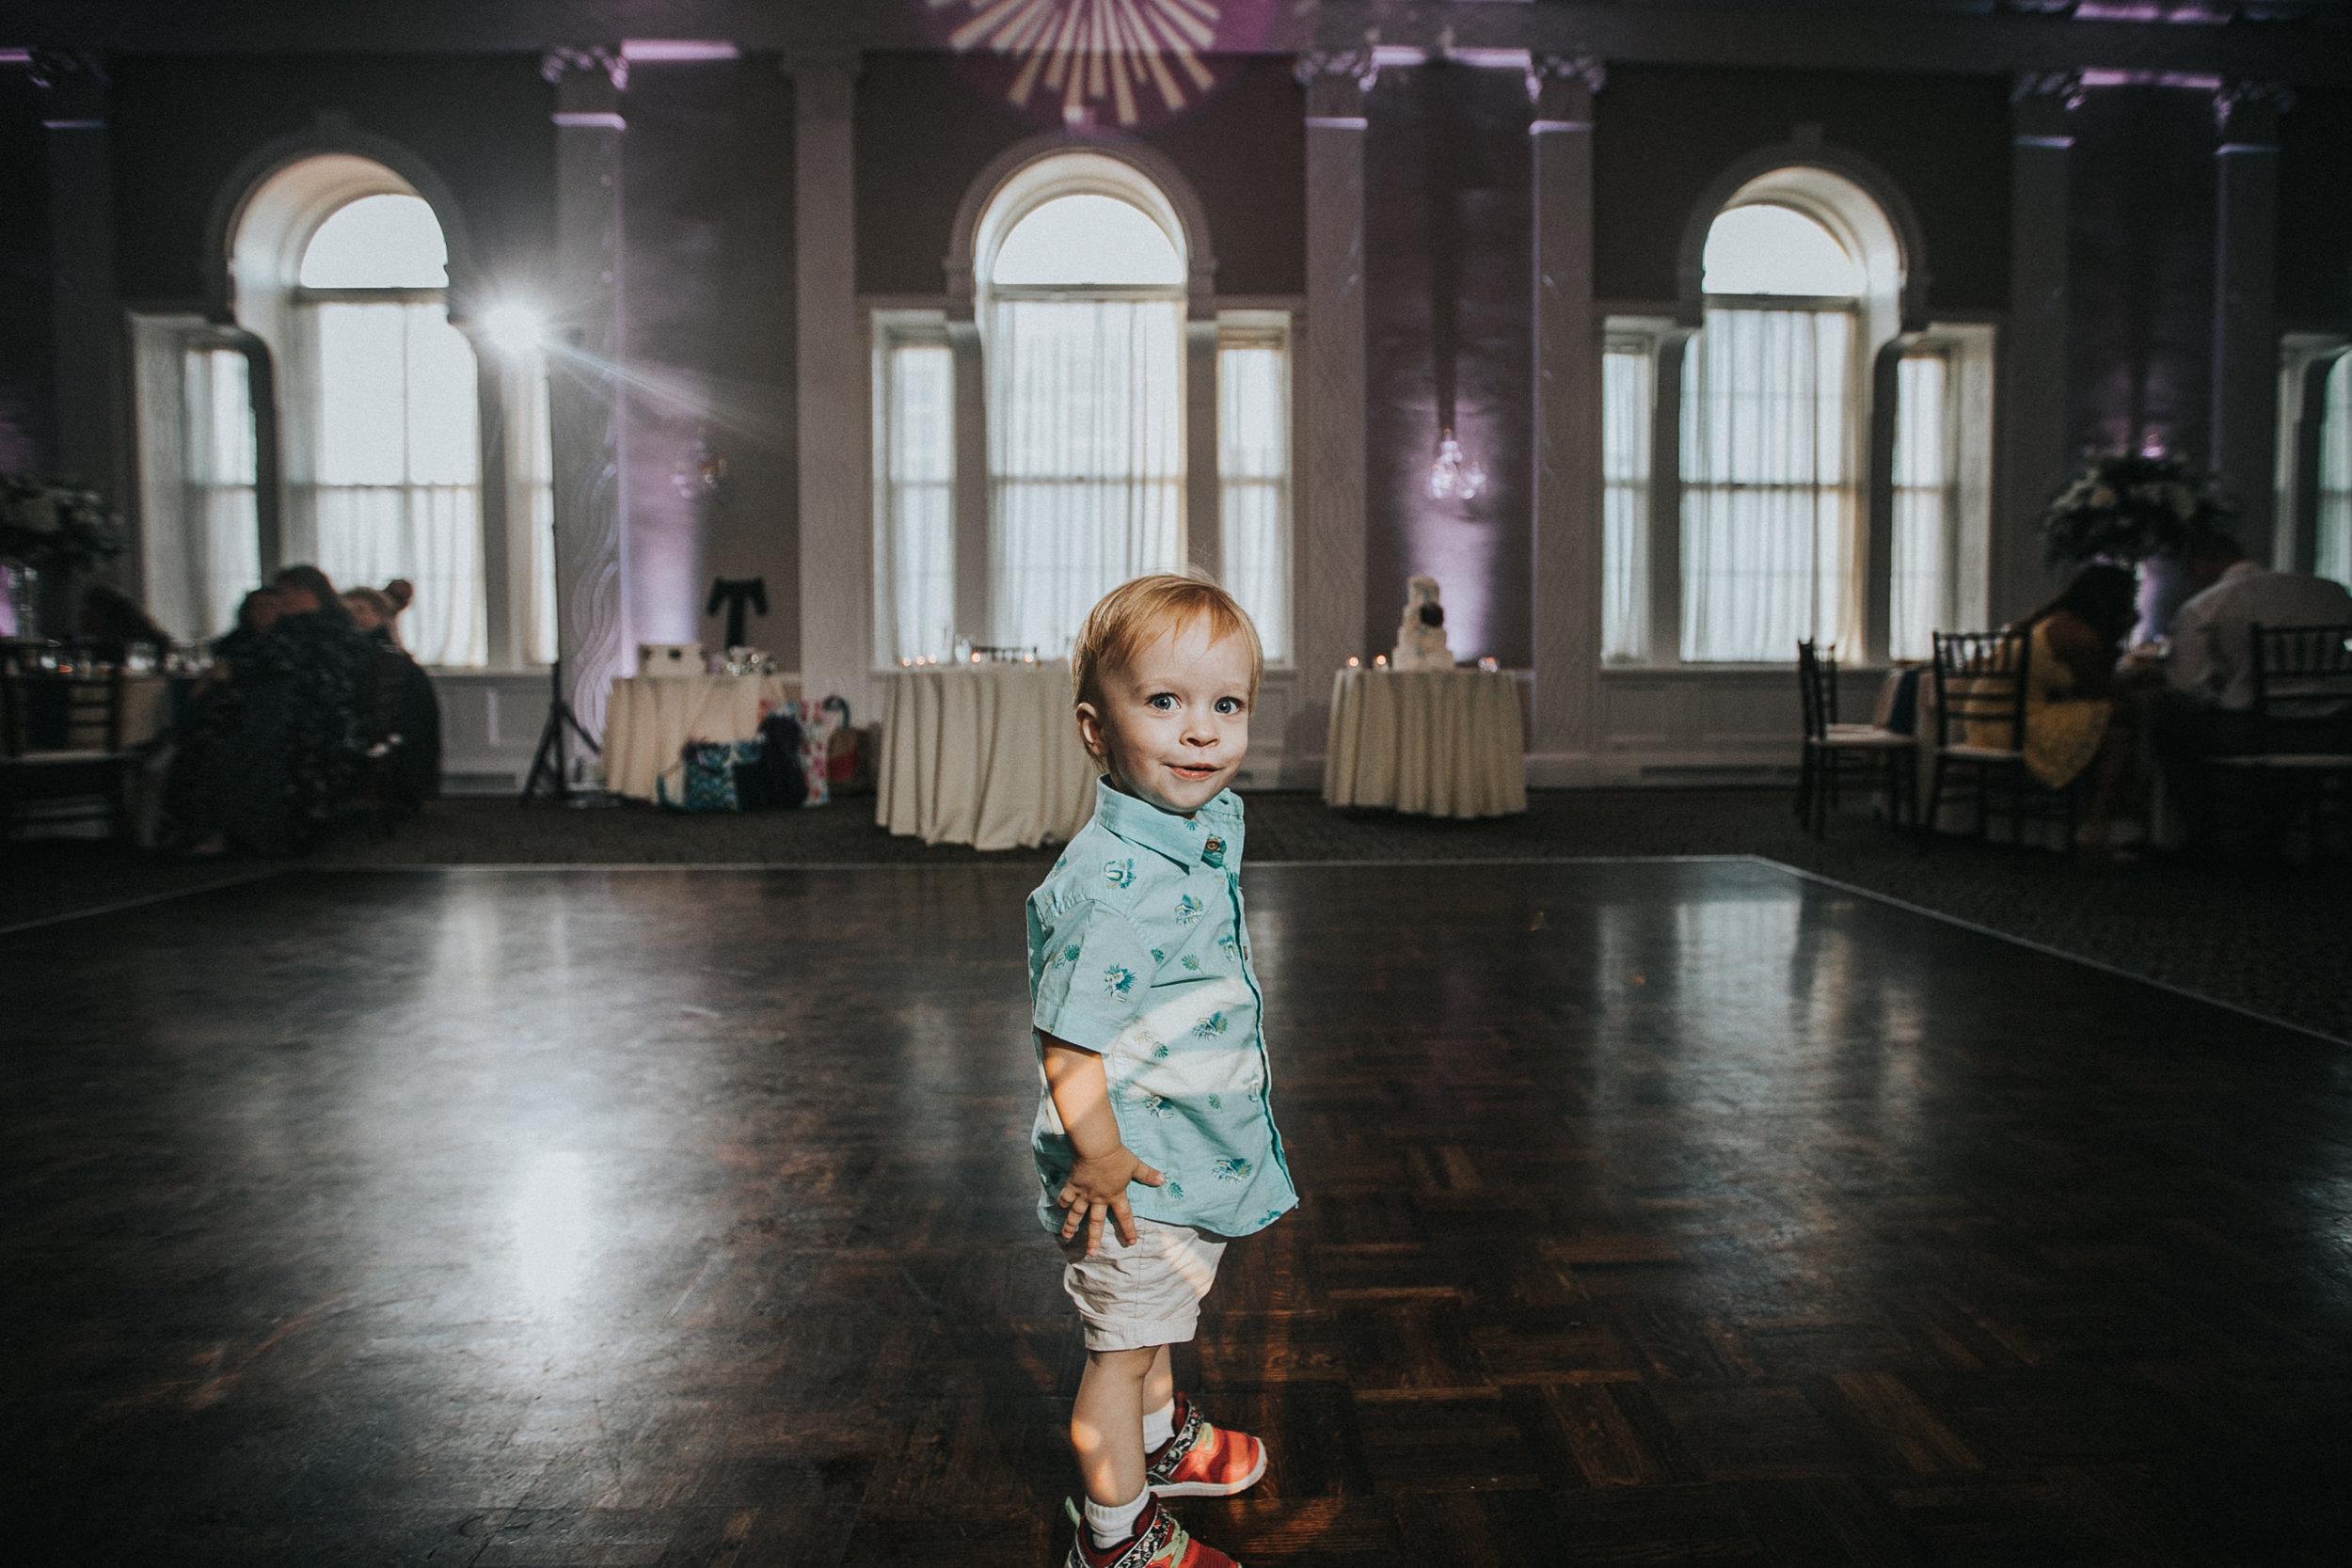 JennaLynnPhotography-NJWeddingPhotographer-Wedding-TheBerkeley-AsburyPark-Allison&Michael-Reception-55.jpg